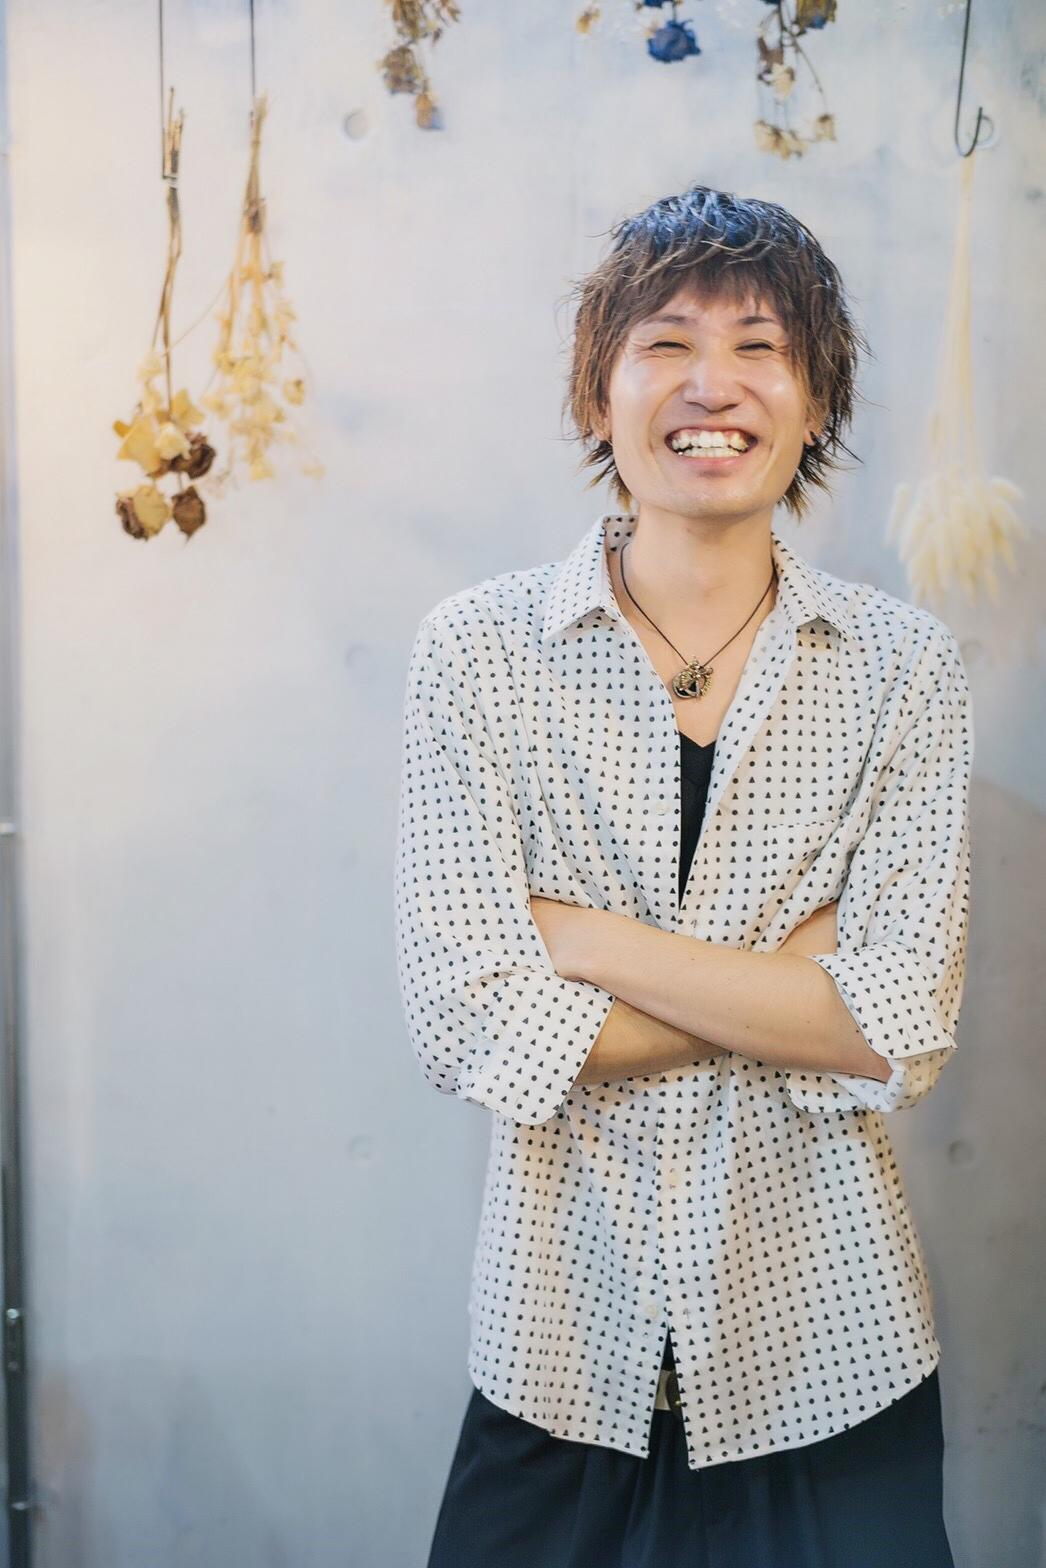 YUSUKE ITO               〜 東京↔︎大阪  2拠点美容師  ITOYAN blog〜